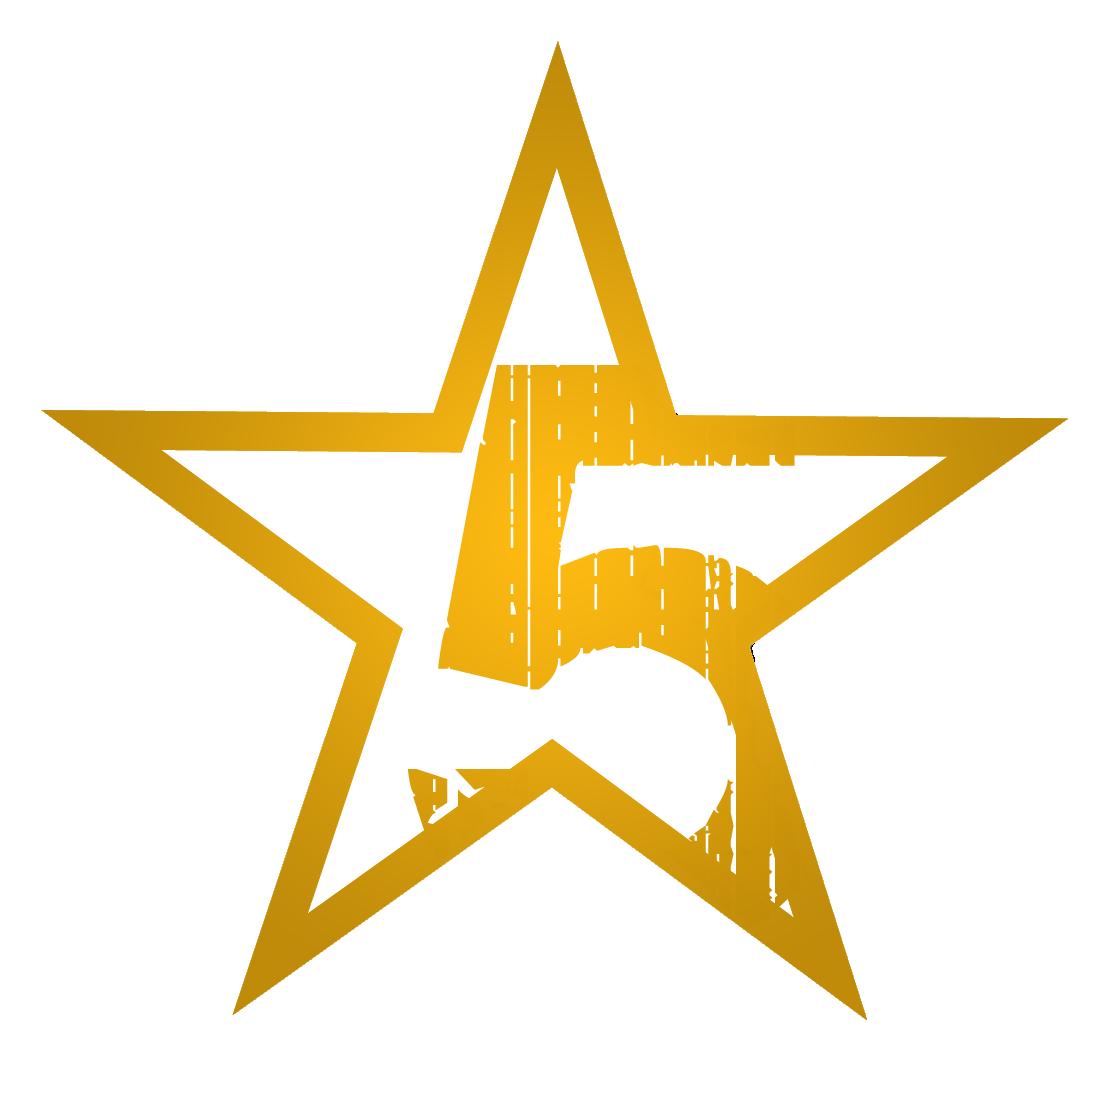 Customer service star clipart clip download 5 Star Service Clipart - Clipart Kid clip download